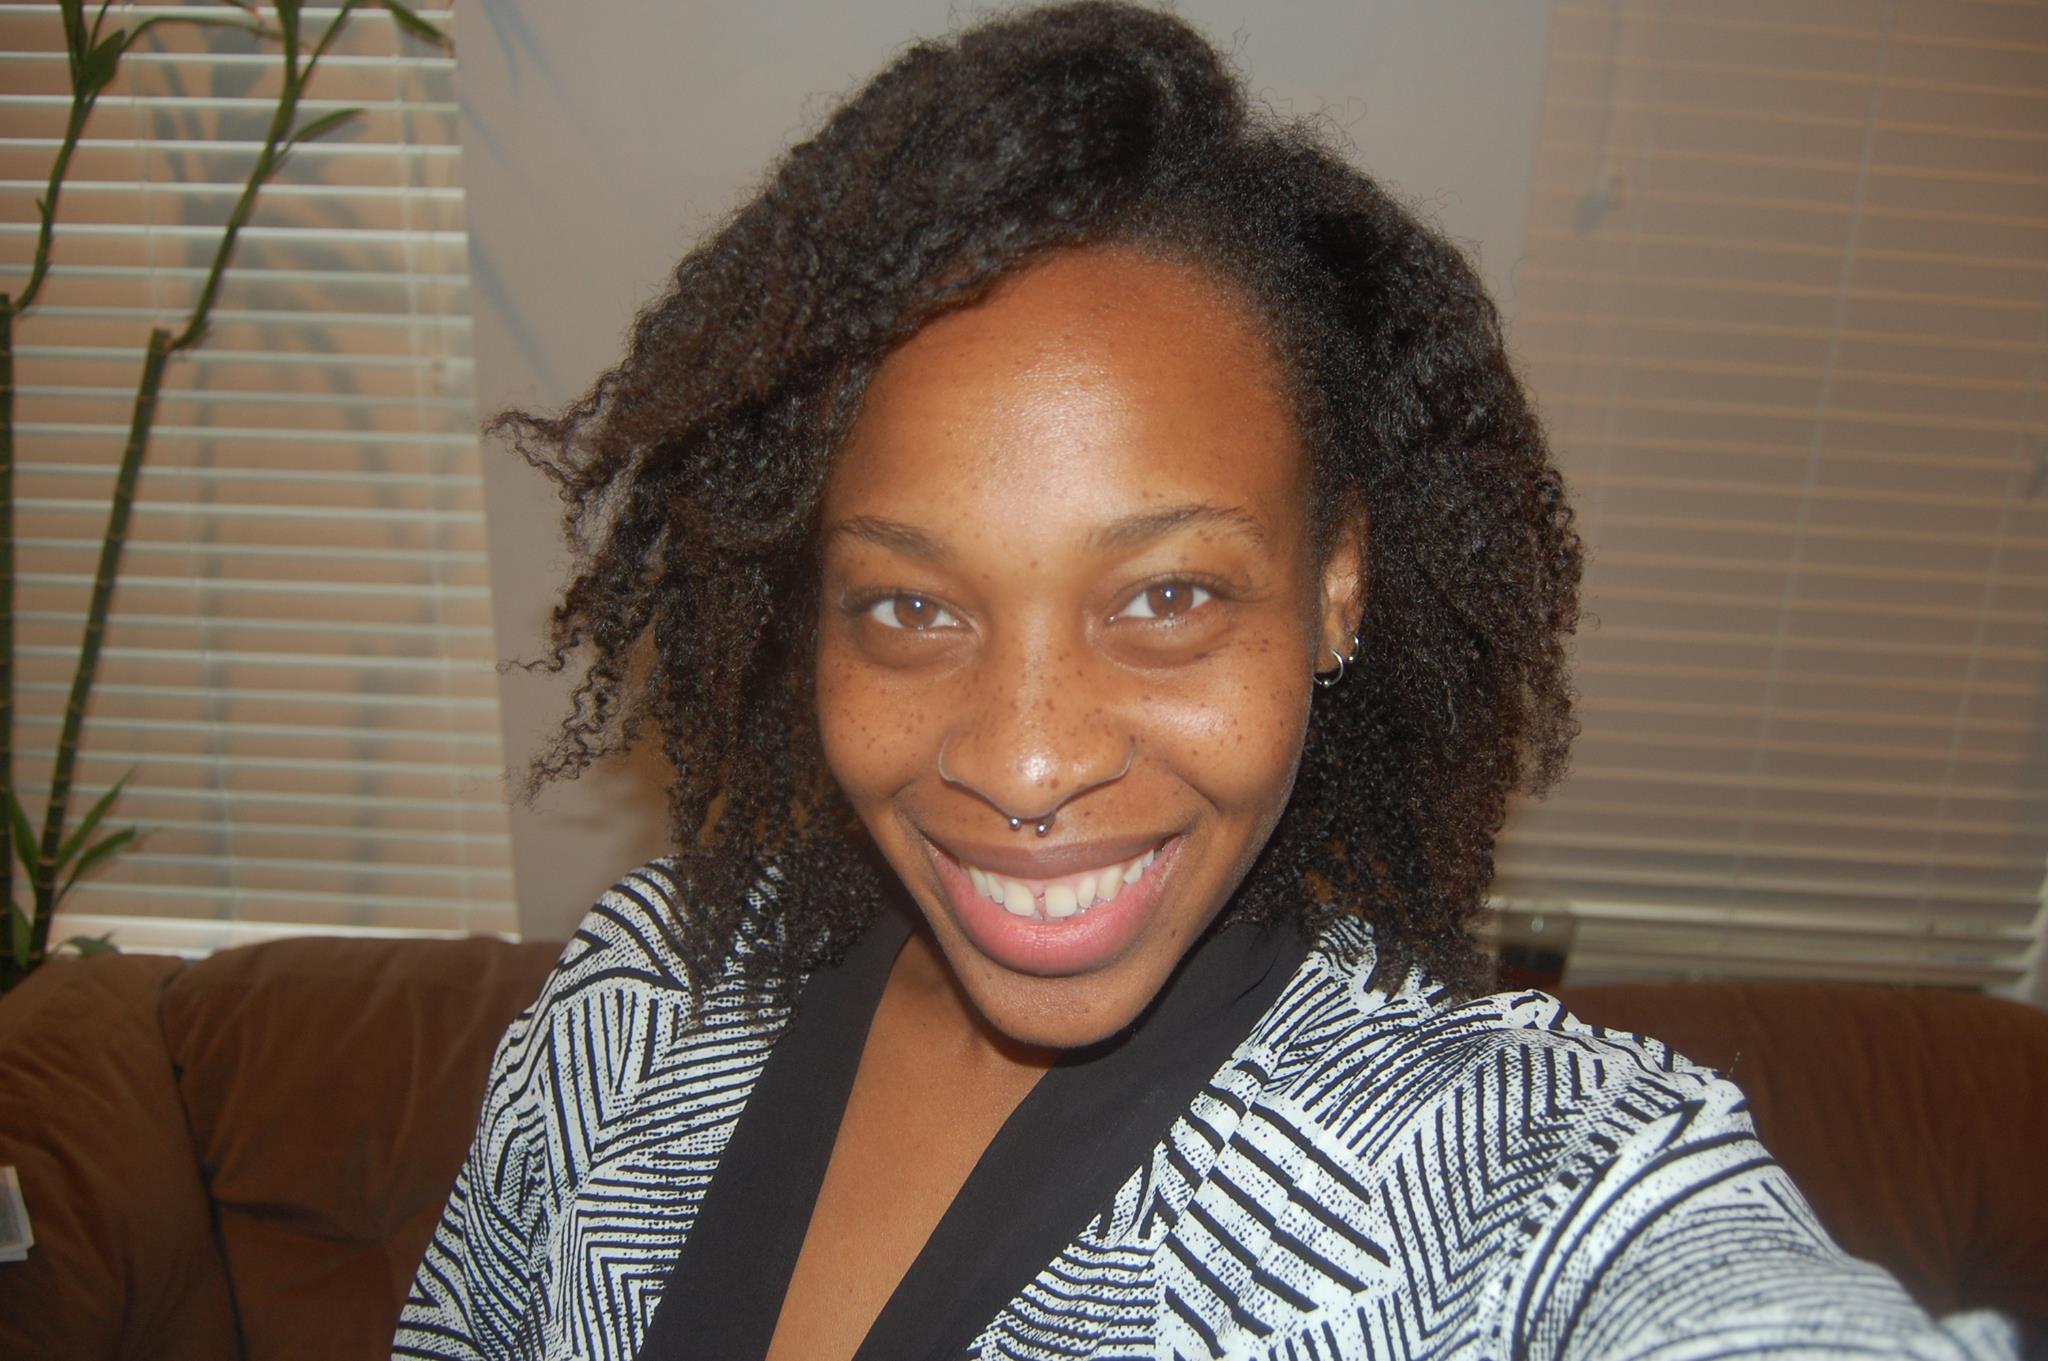 Black Girl With Long Hair